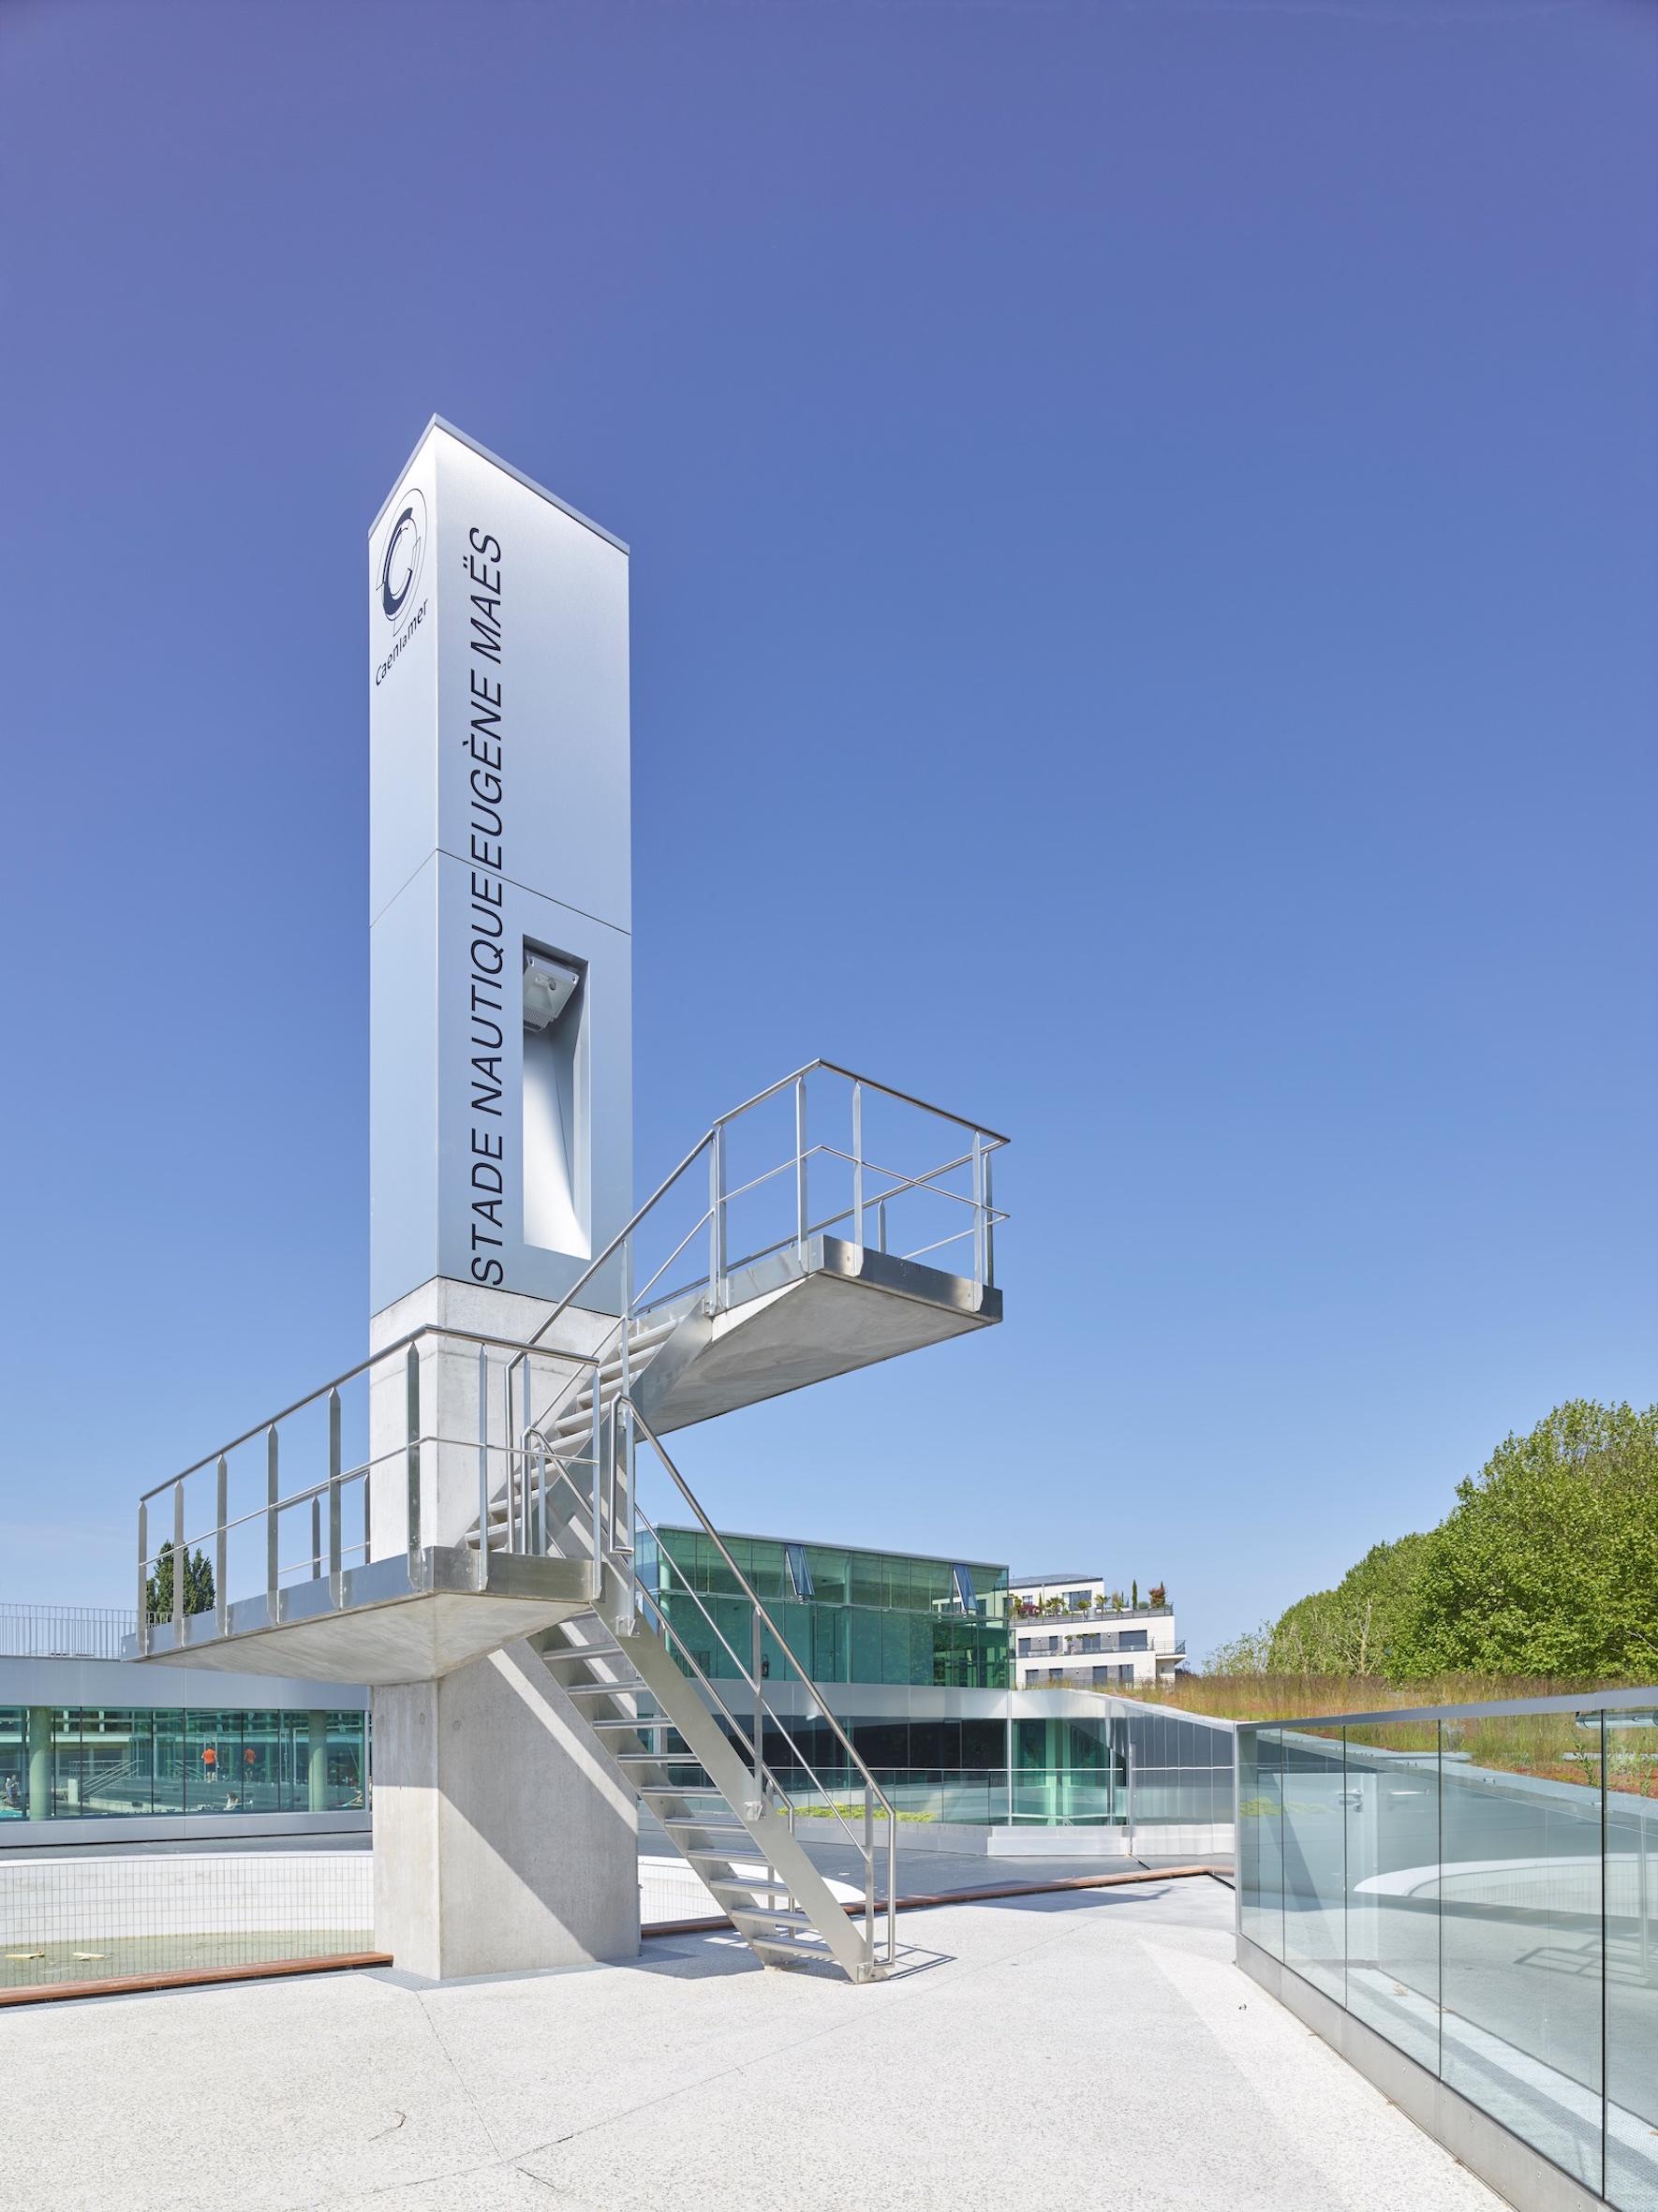 stade nautique 13 - Stade nautique - Caen